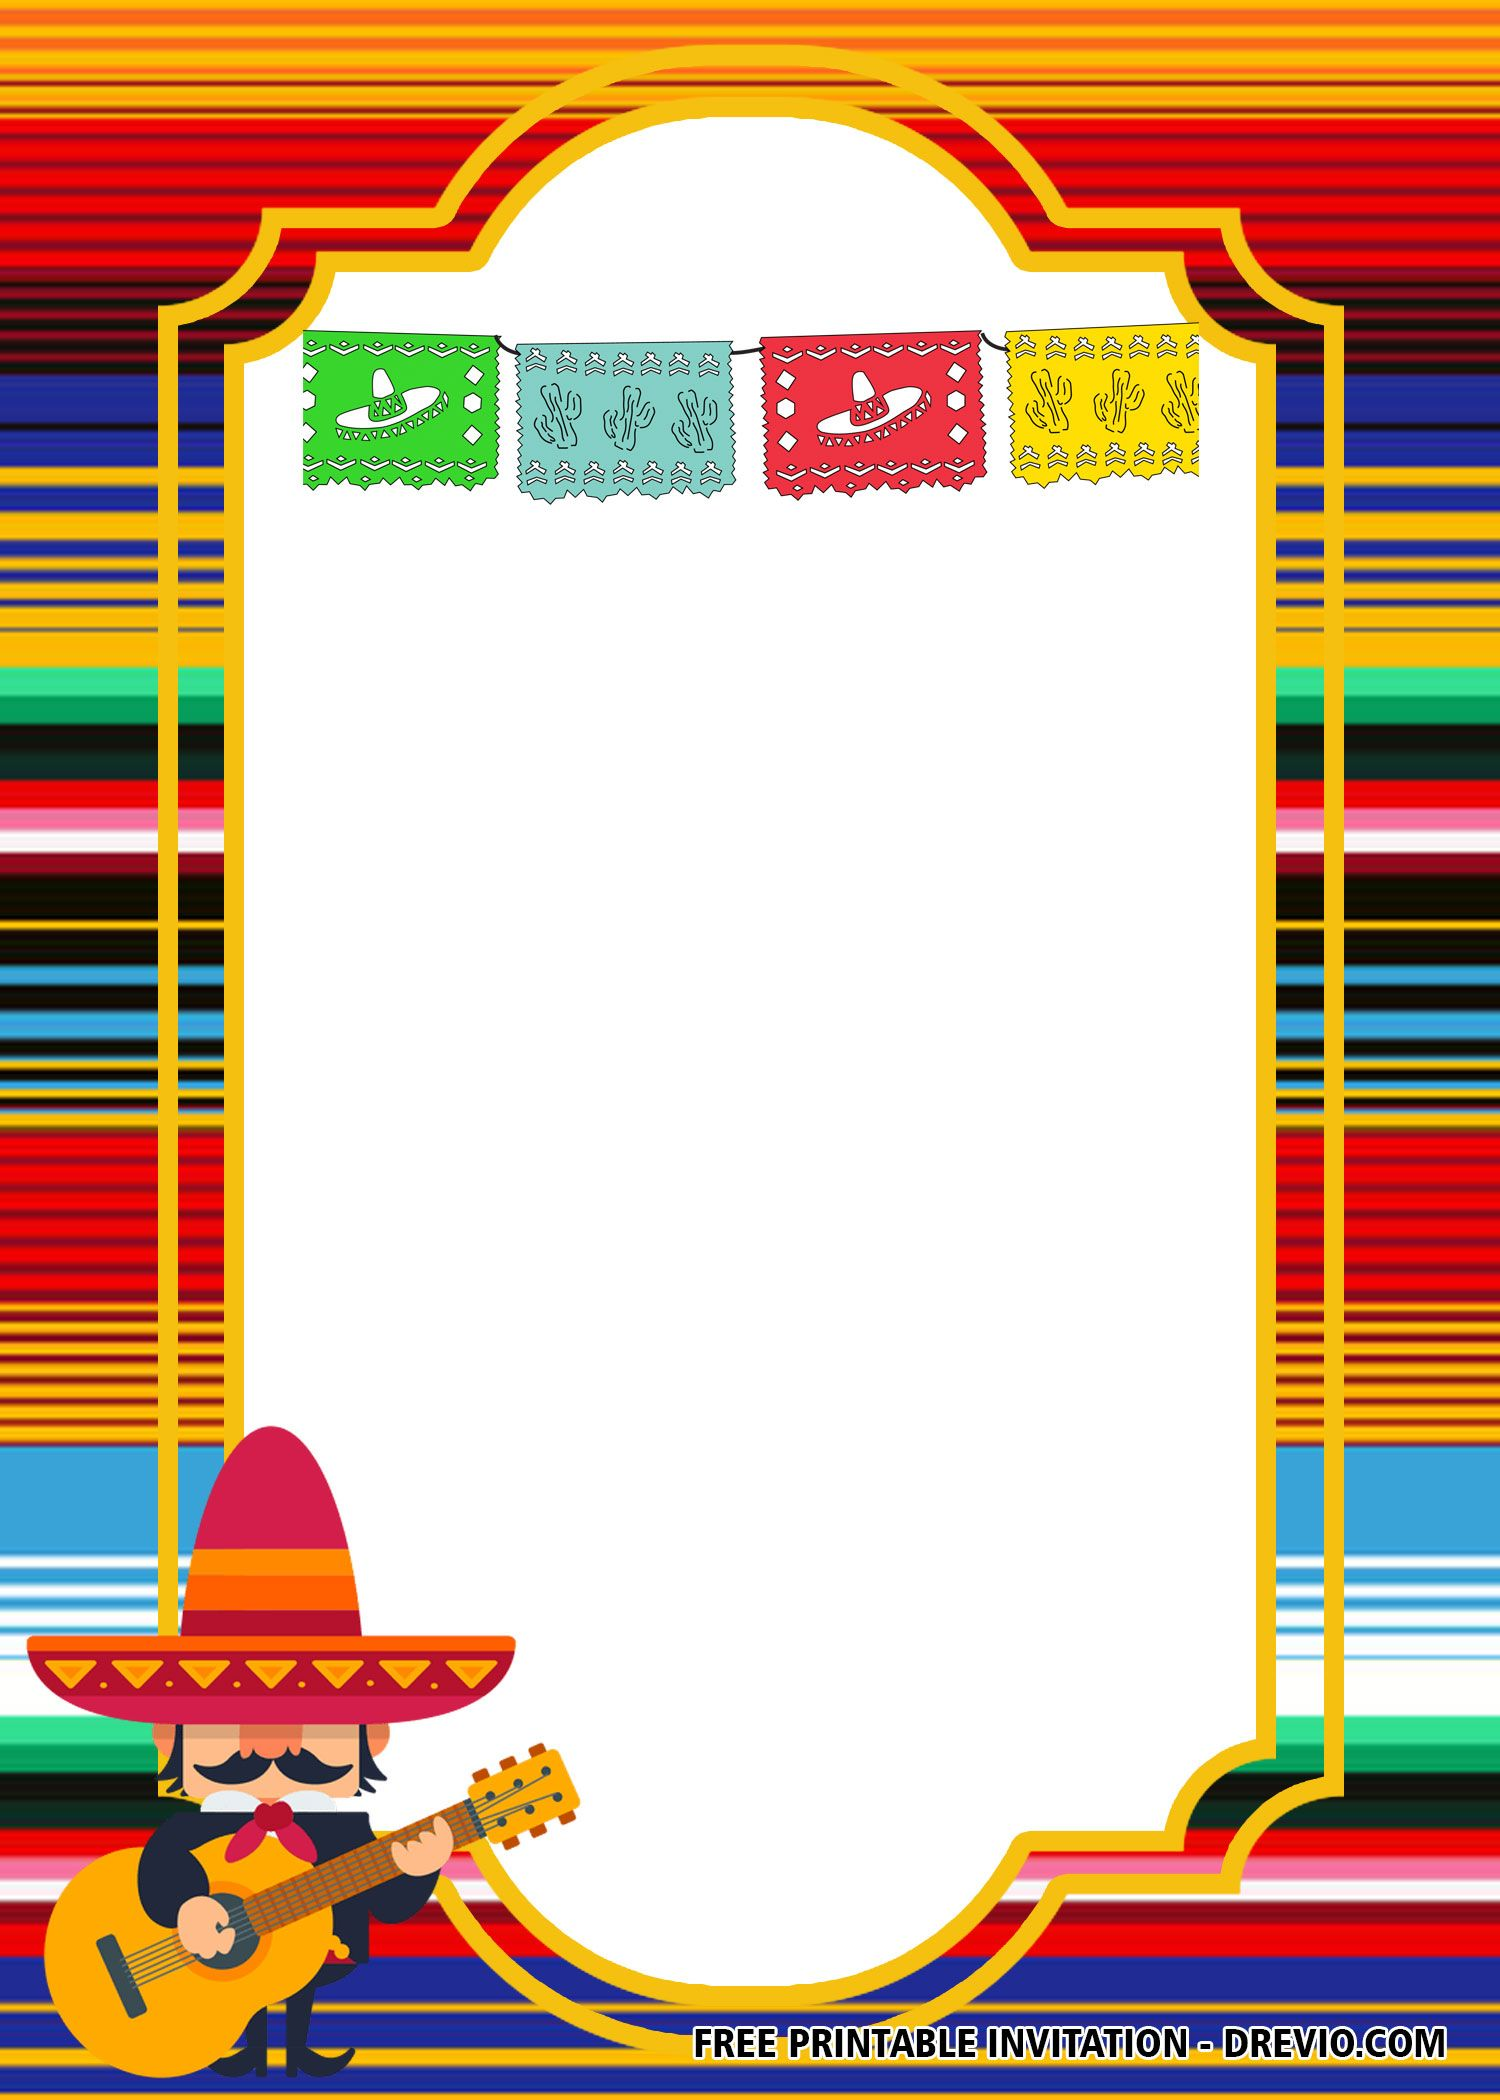 Free Fiesta Baby Shower Invitation Templates Drevio Fiesta Baby Shower Invitations Baby Shower Invitation Templates Fiesta Baby Shower